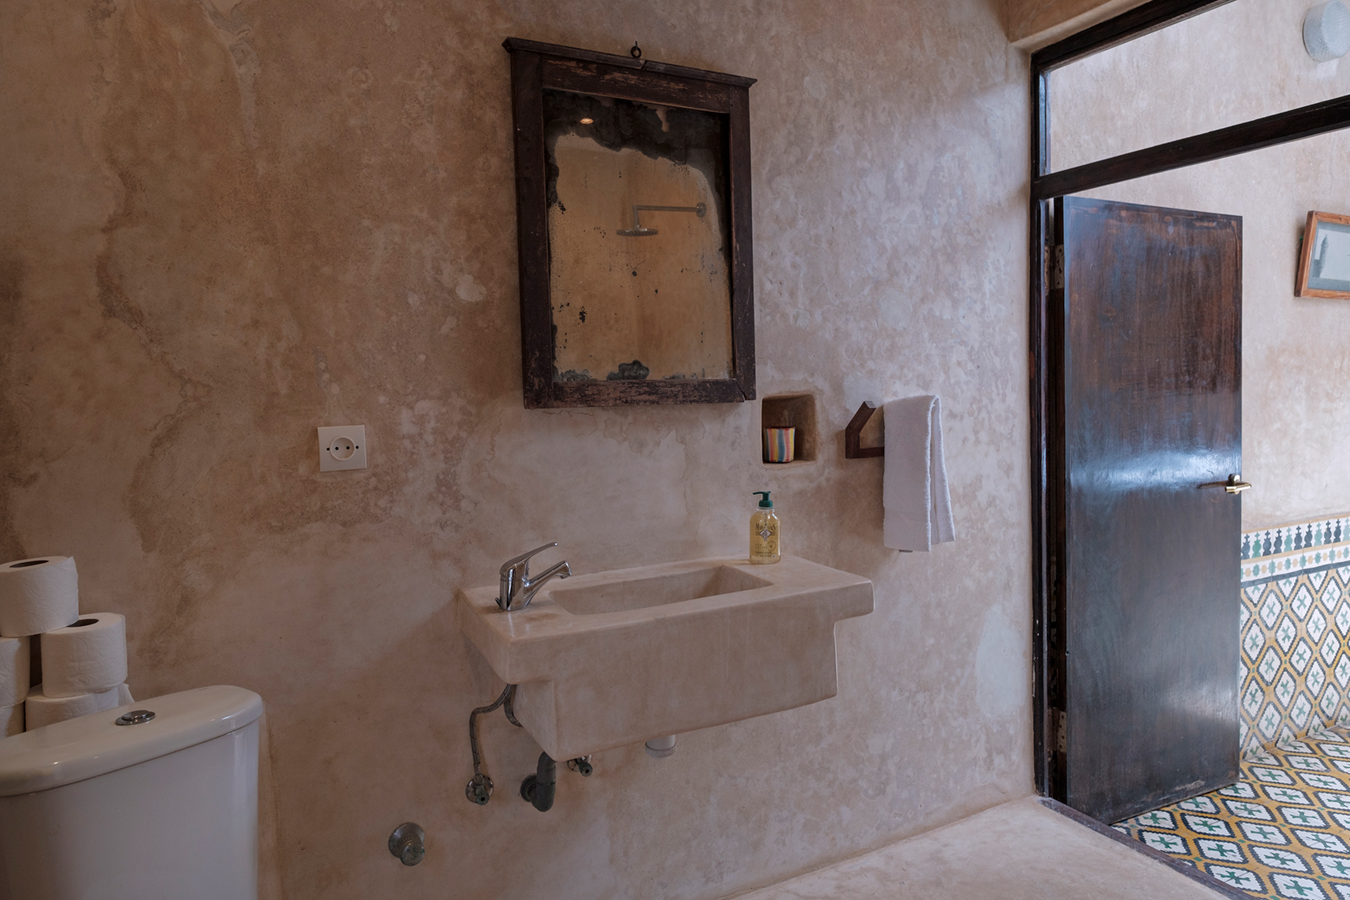 dar-emma-bathroom-1.jpg